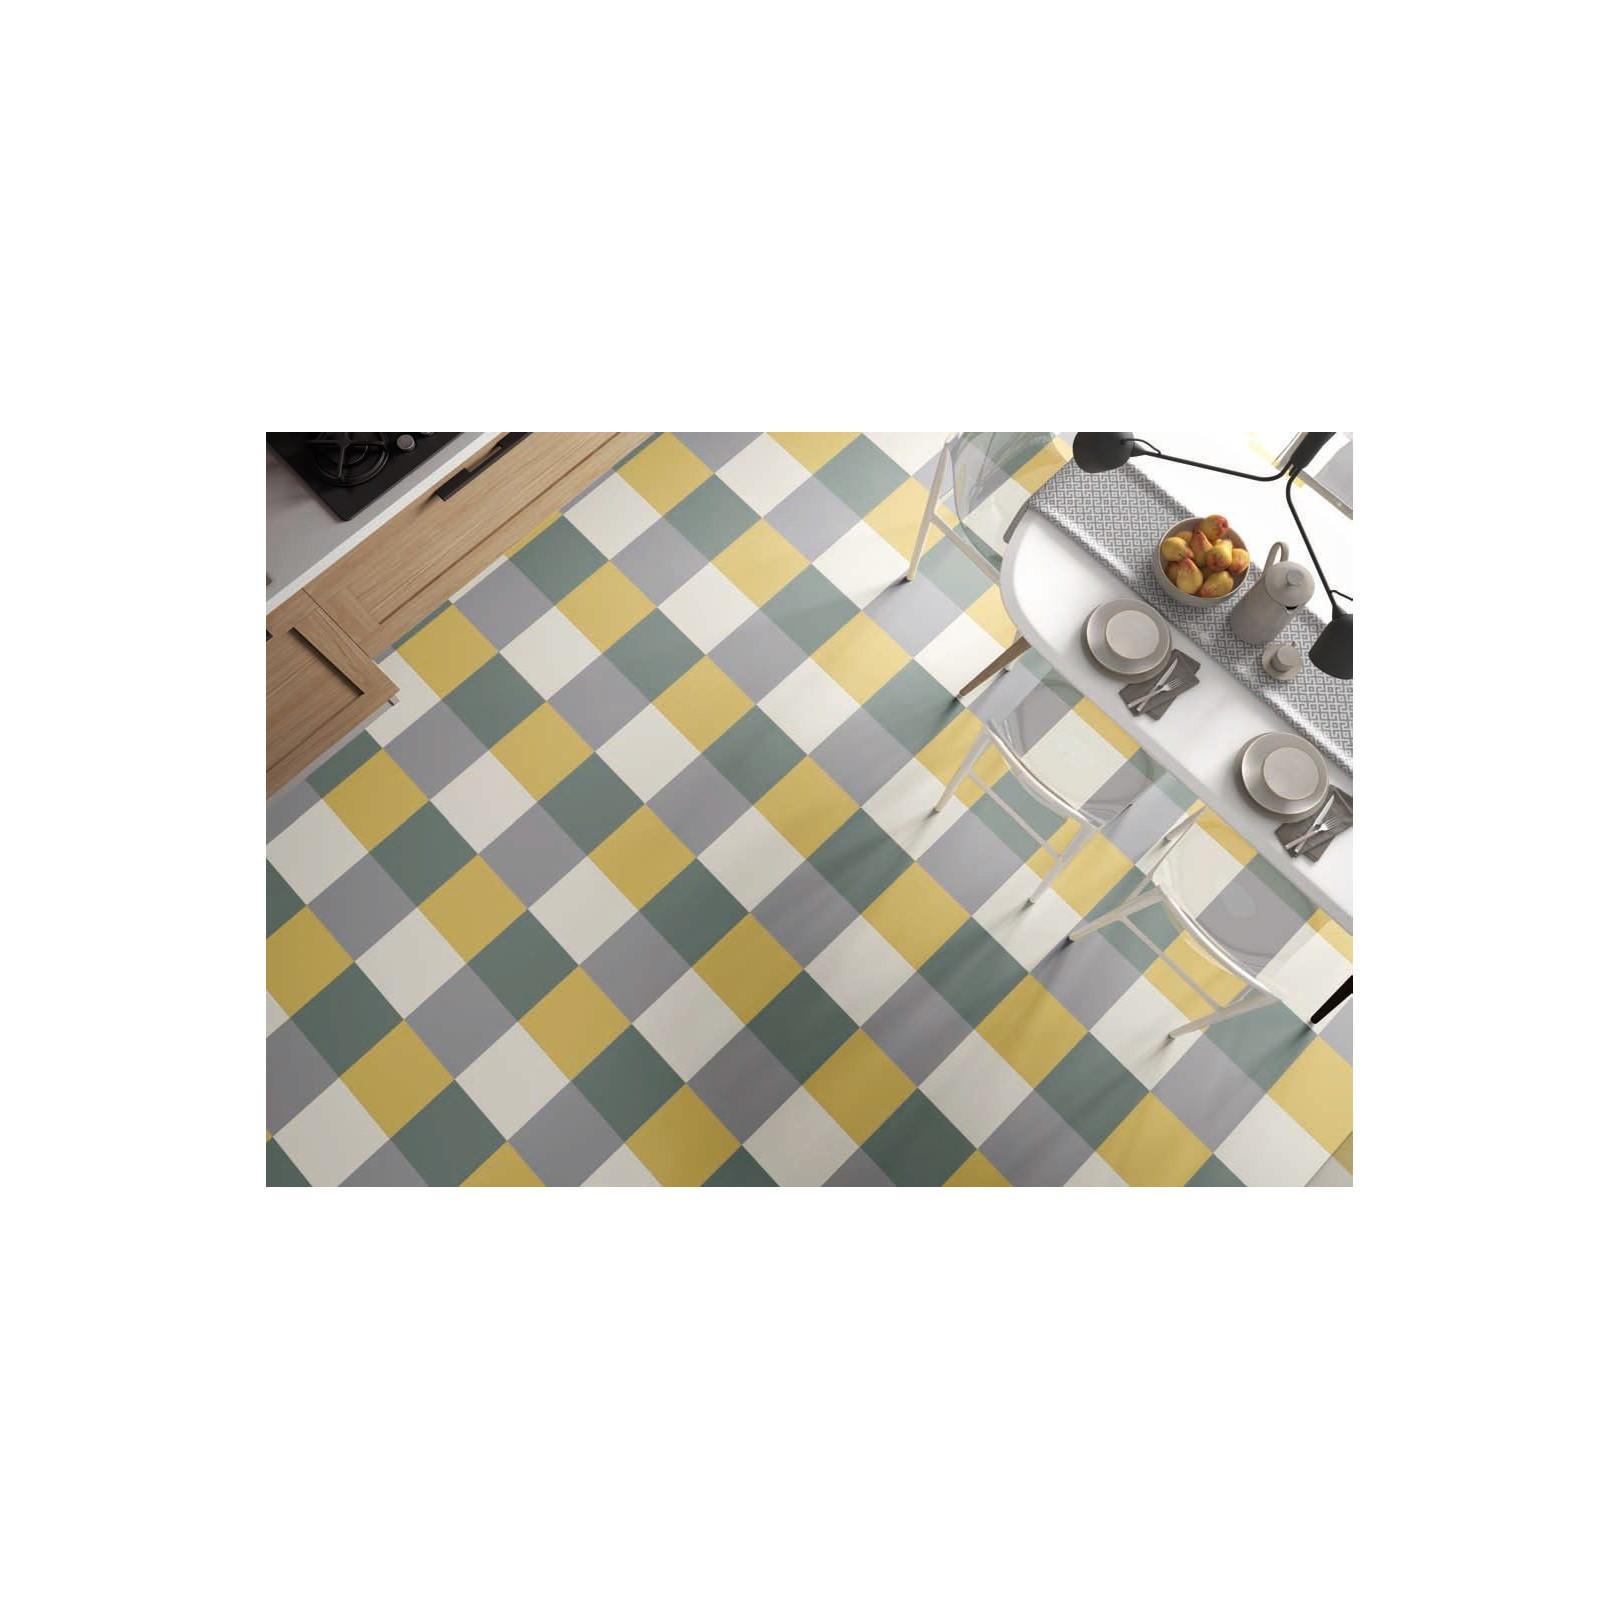 Carrelage grès cérame 25x25 Basic, 25x25cm (11 couleurs)